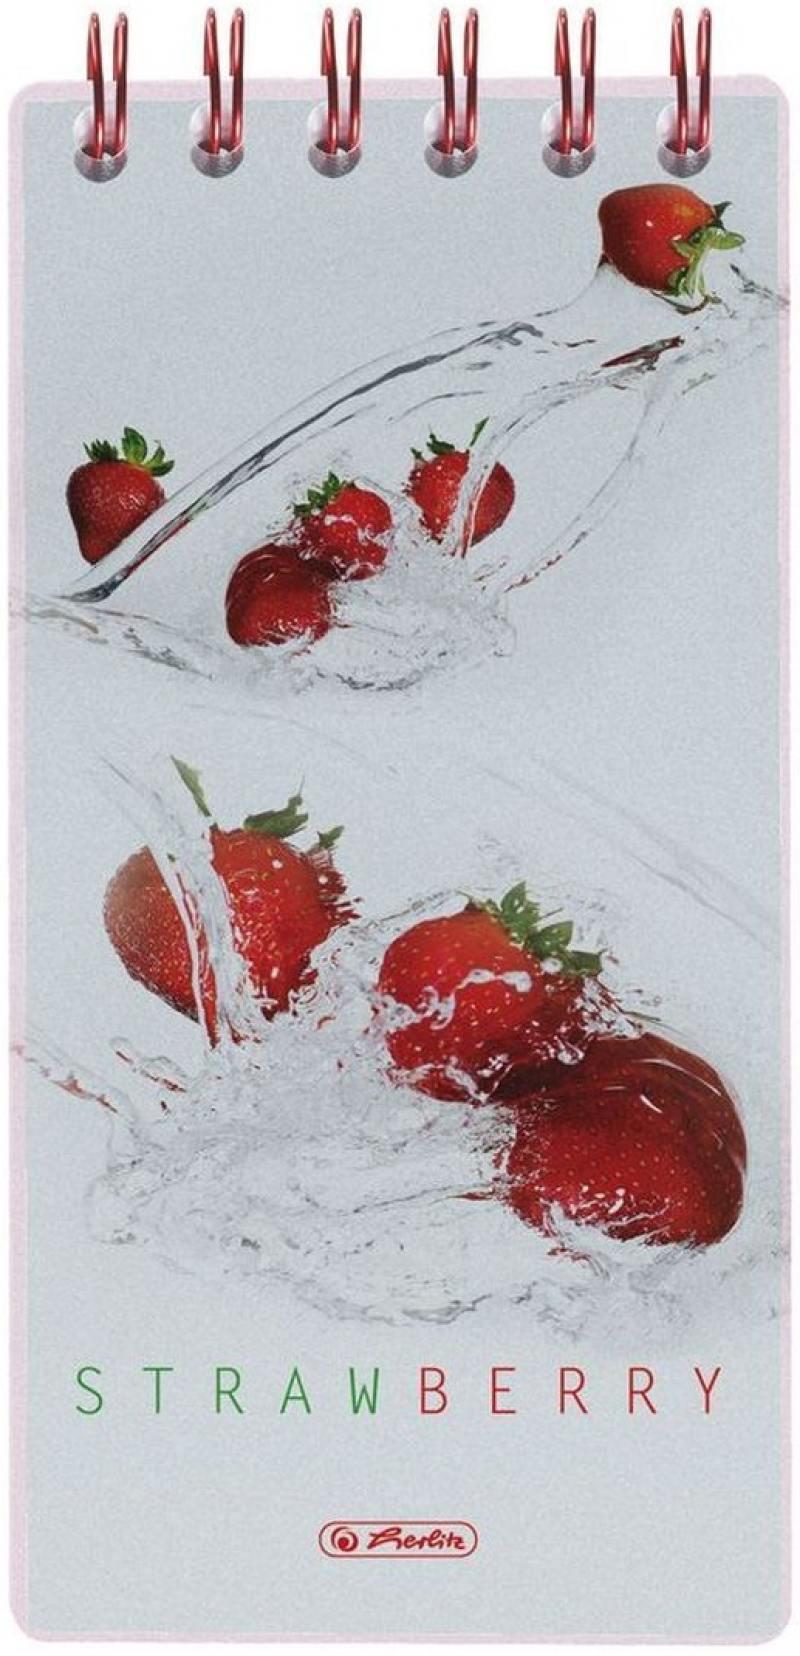 Блокнот Herlitz Fresh Fruit Strawberry 8.5x17 см 100 листов 11306248 11306248 блокнот на спирали herlitz fresh fruit лайм клетка а6 100 листов